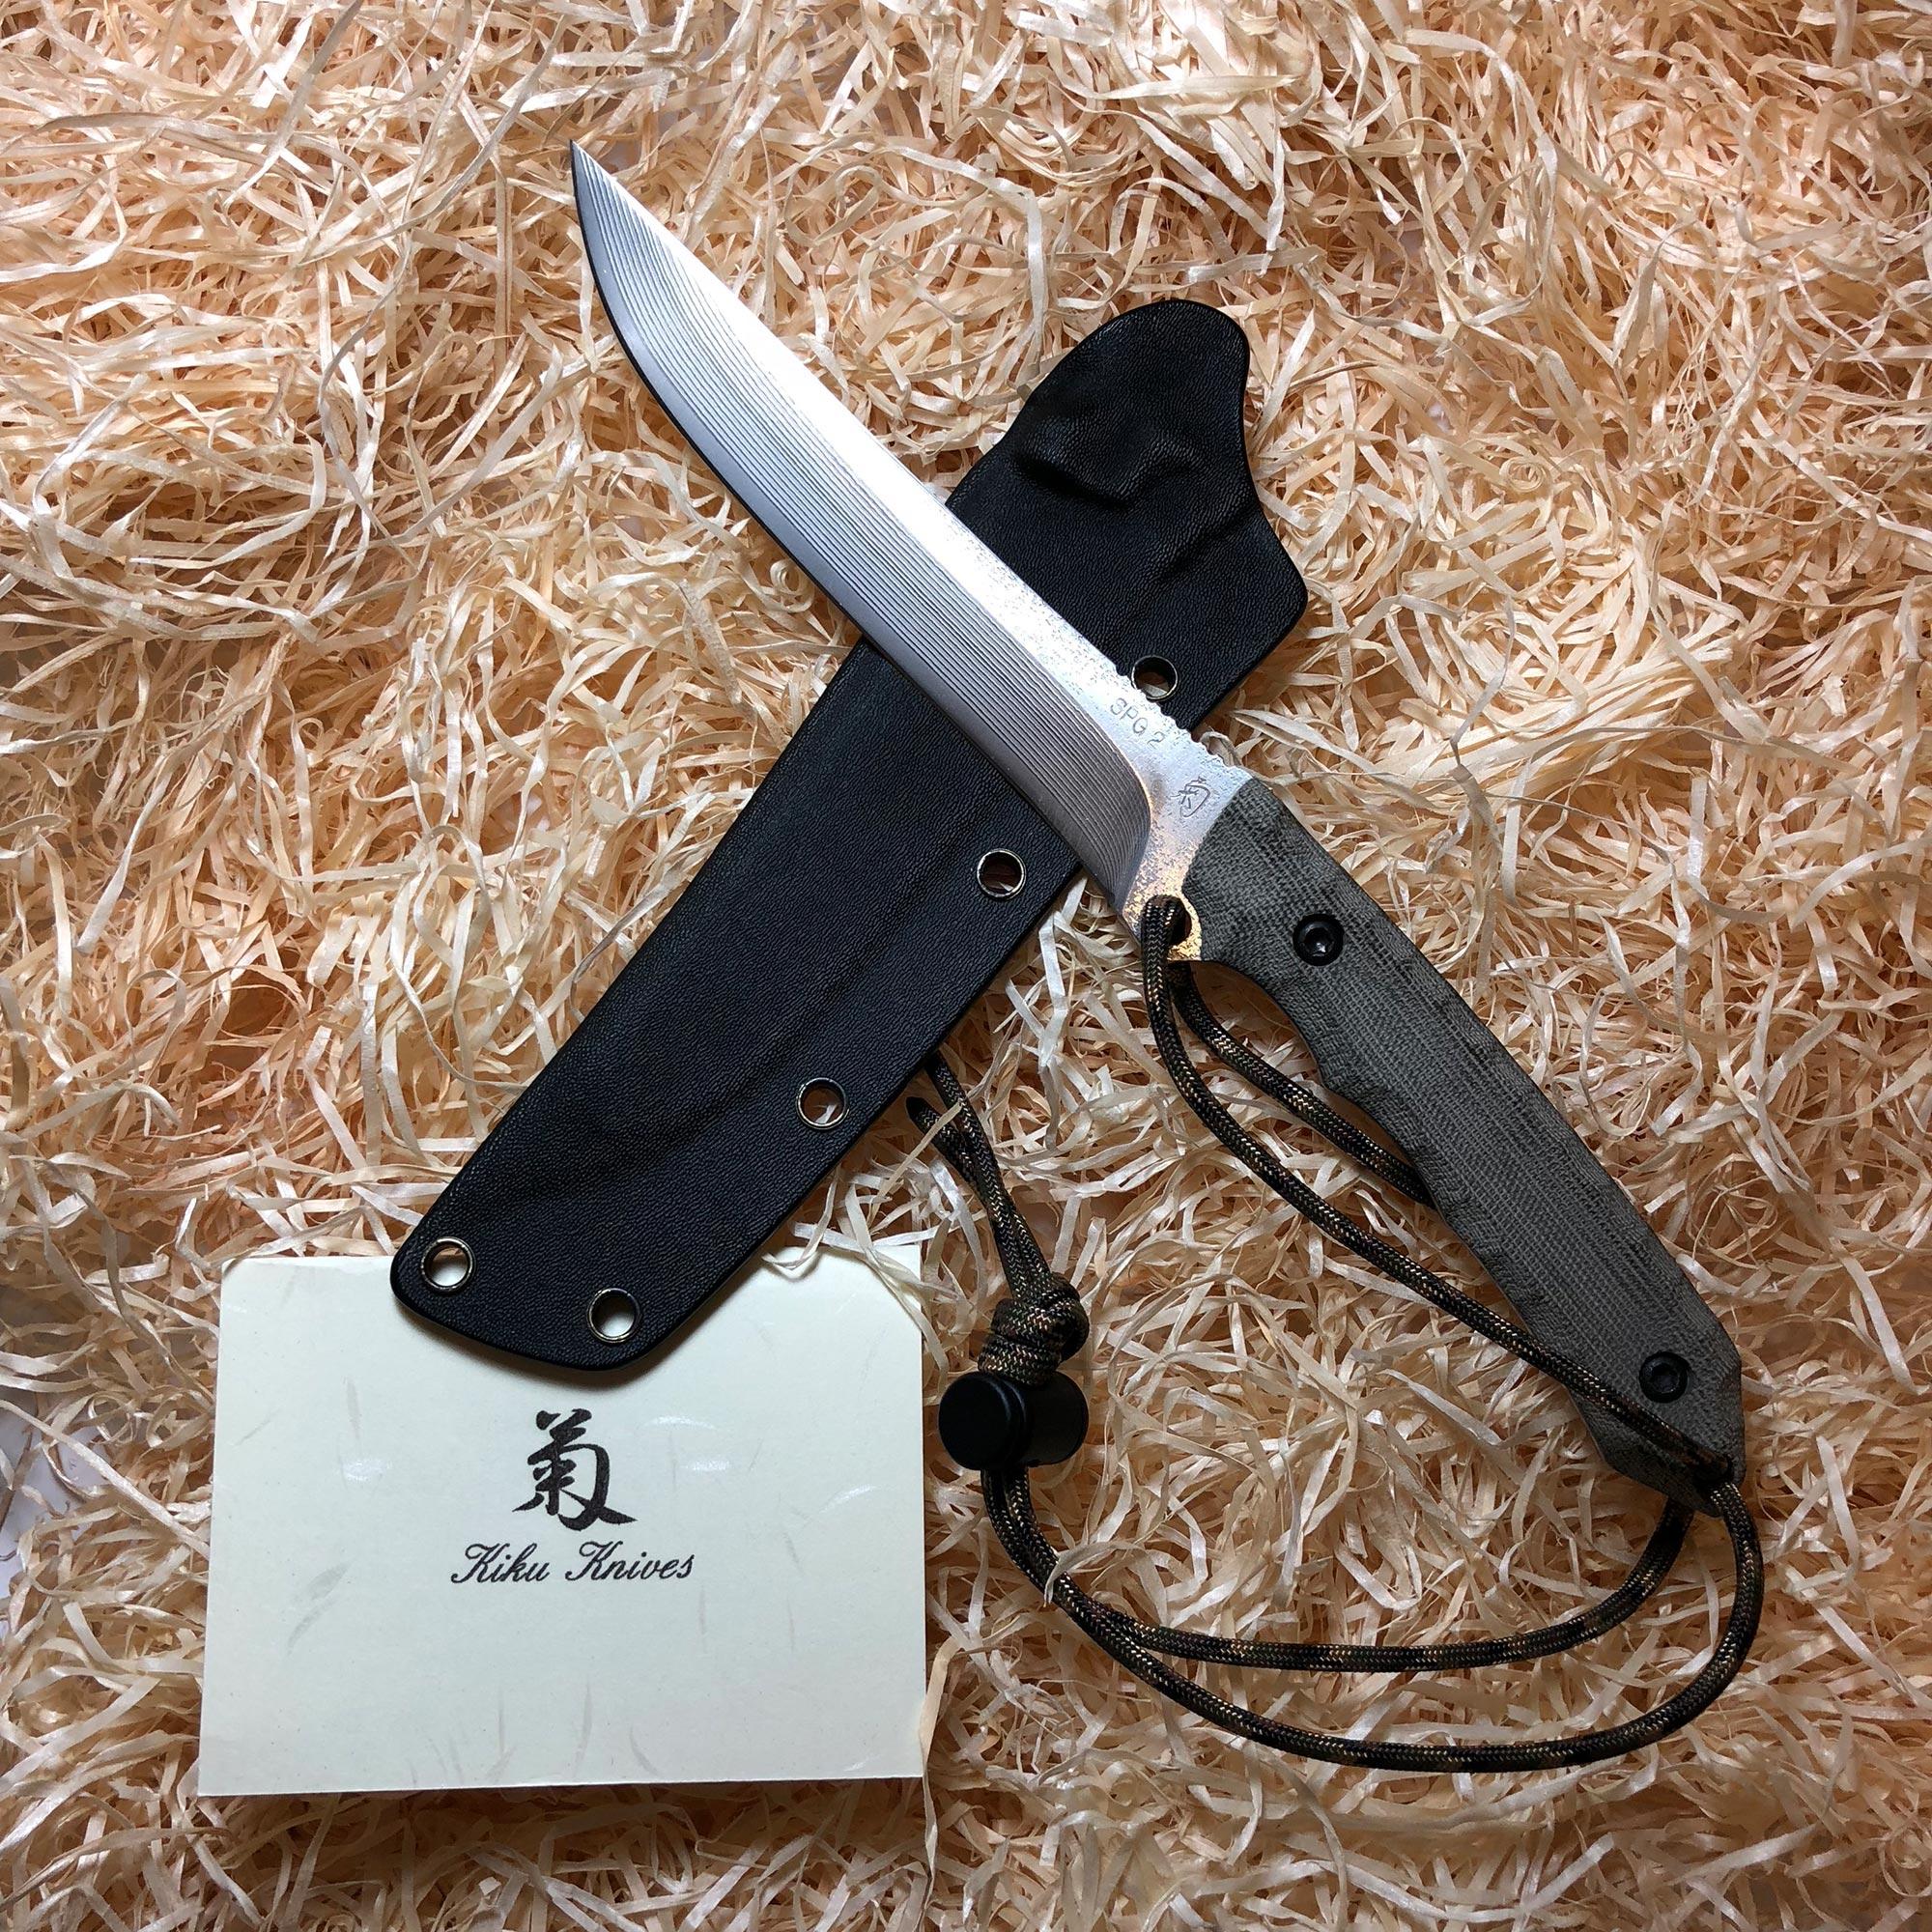 hamakaze kiku knives wolfknives feines werkzeug handwerk. Black Bedroom Furniture Sets. Home Design Ideas